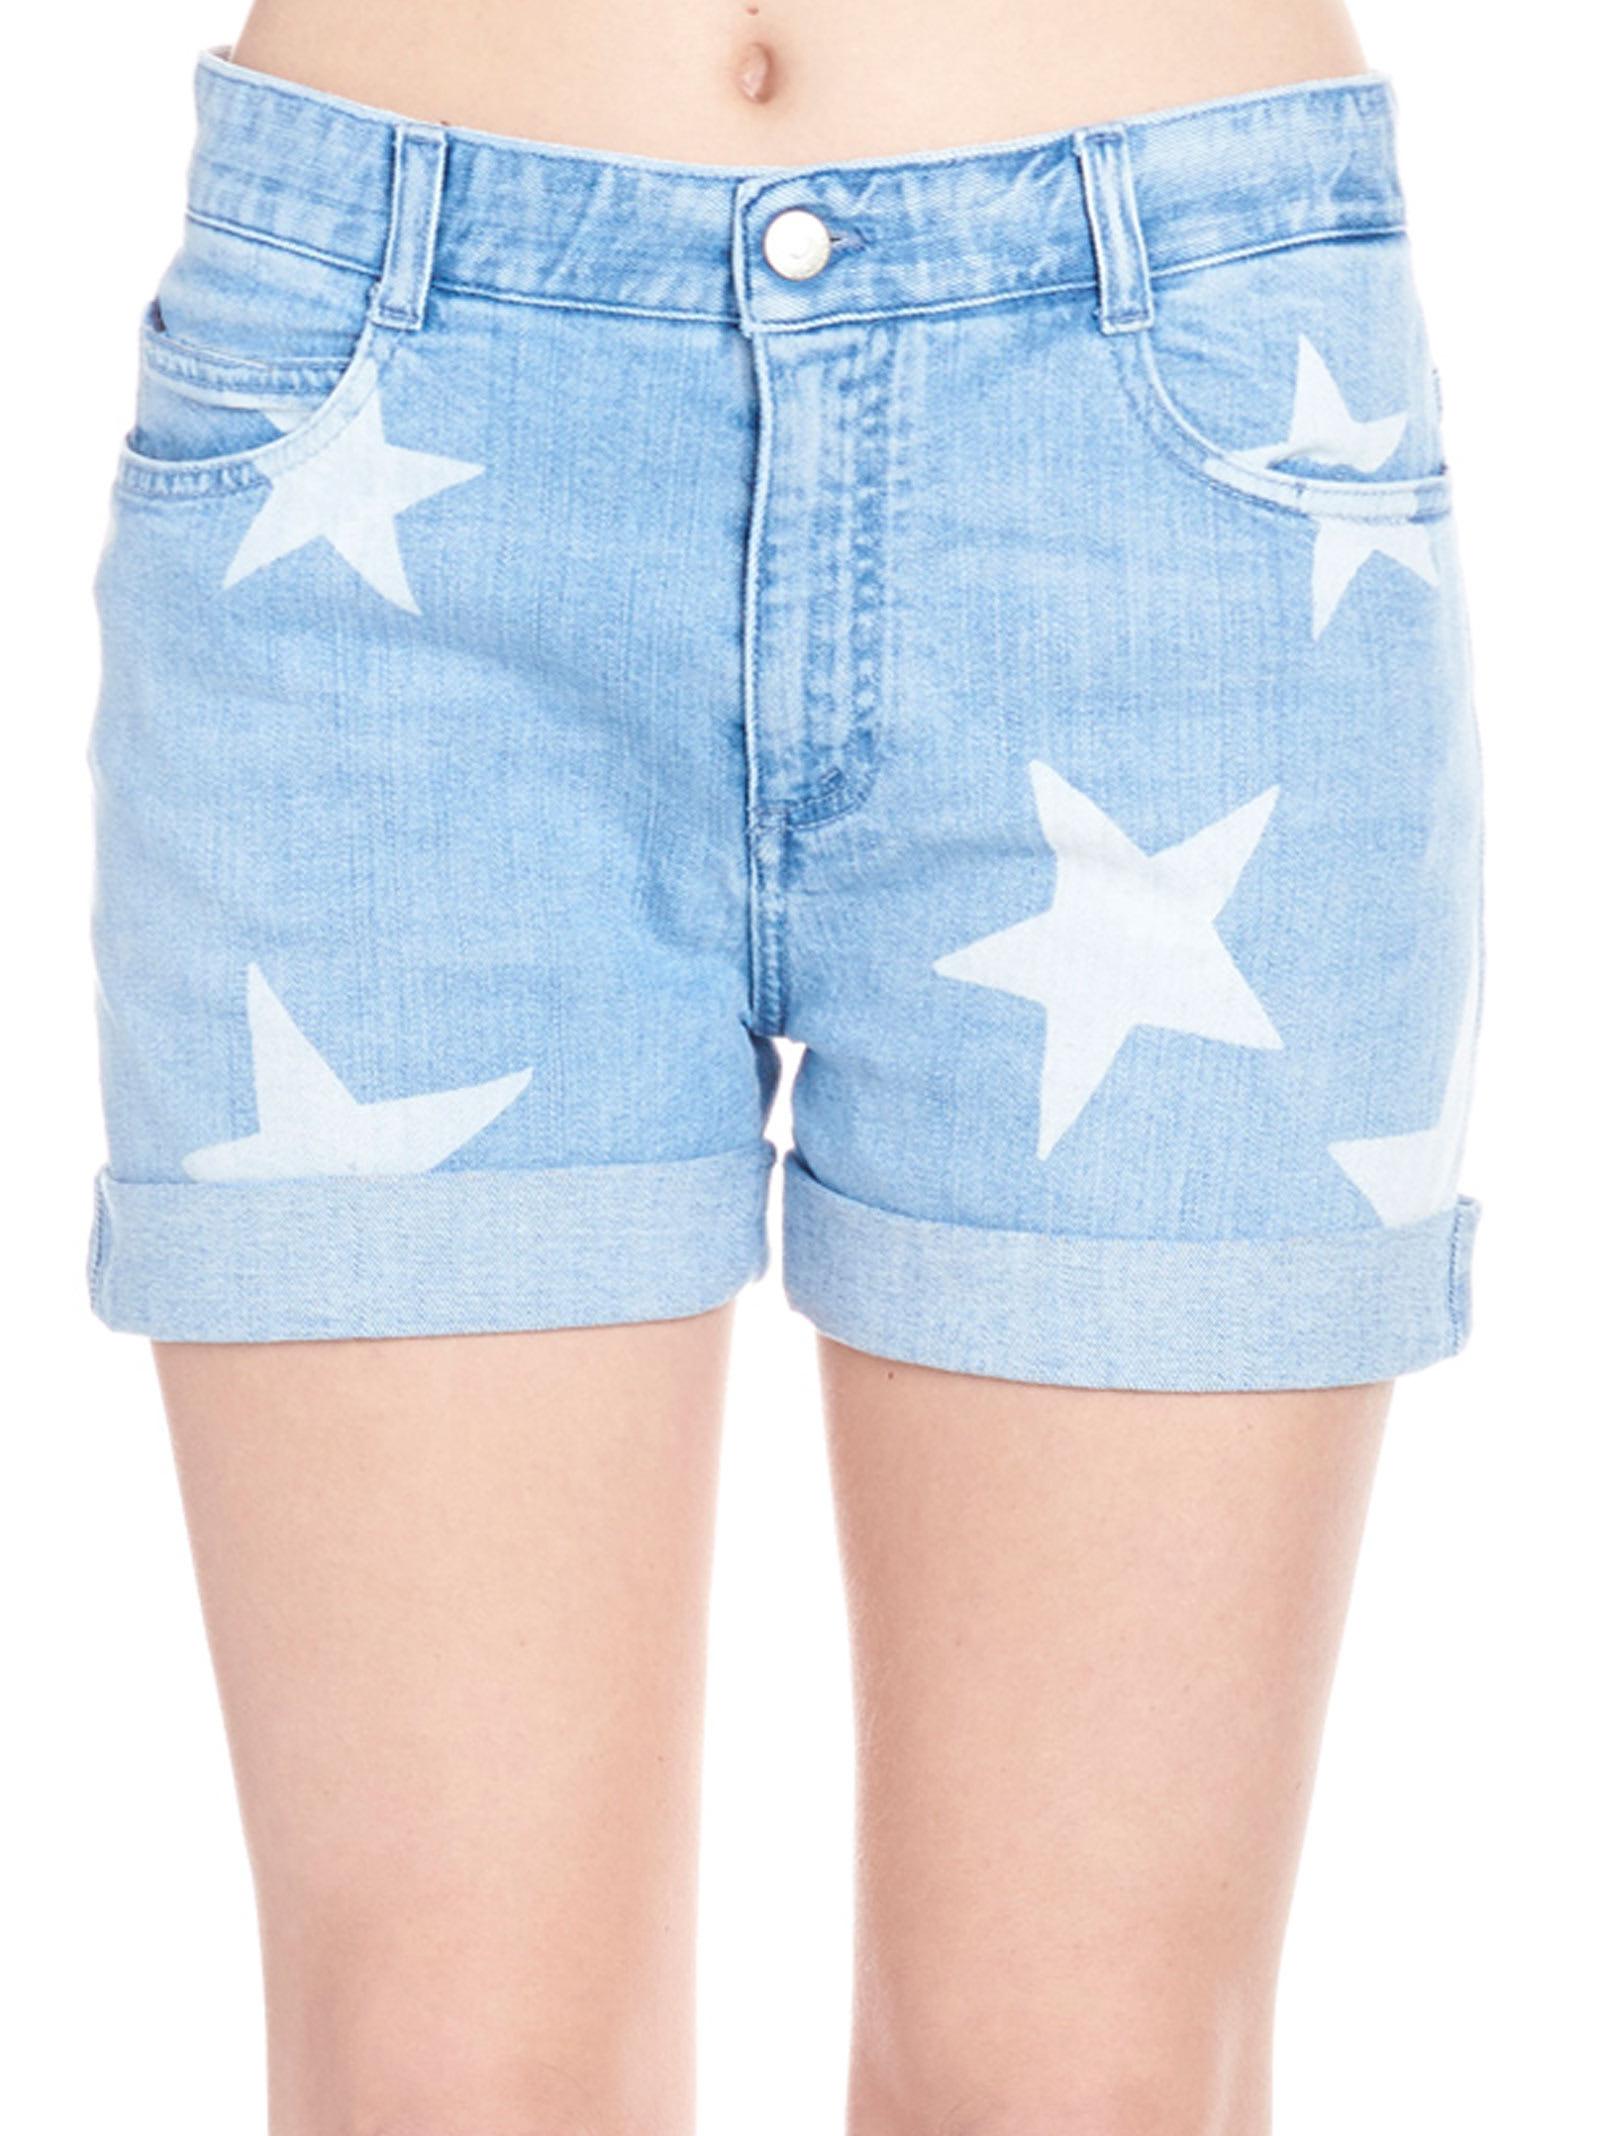 Stella Mccartney Shorts Stella Mccartney Short